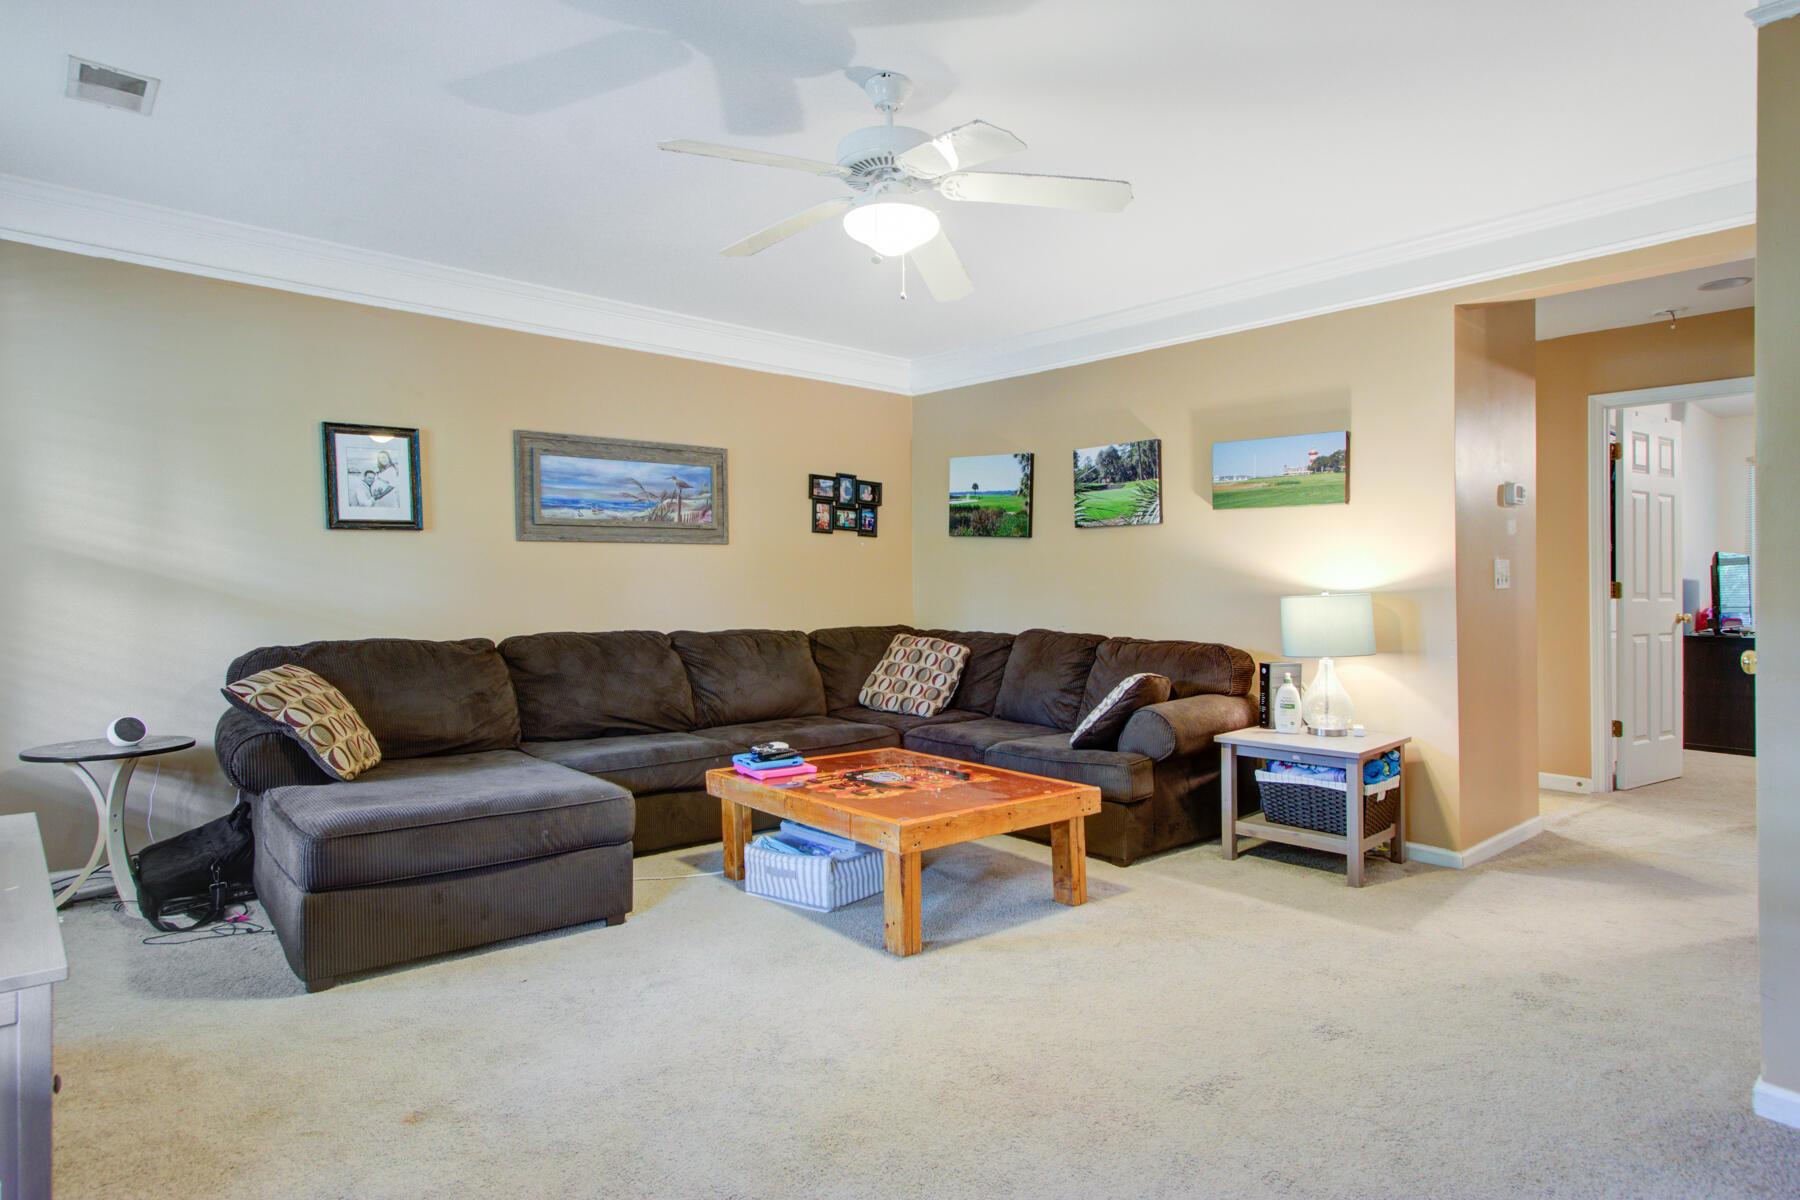 Dunes West Homes For Sale - 2232 Kings Gate, Mount Pleasant, SC - 23